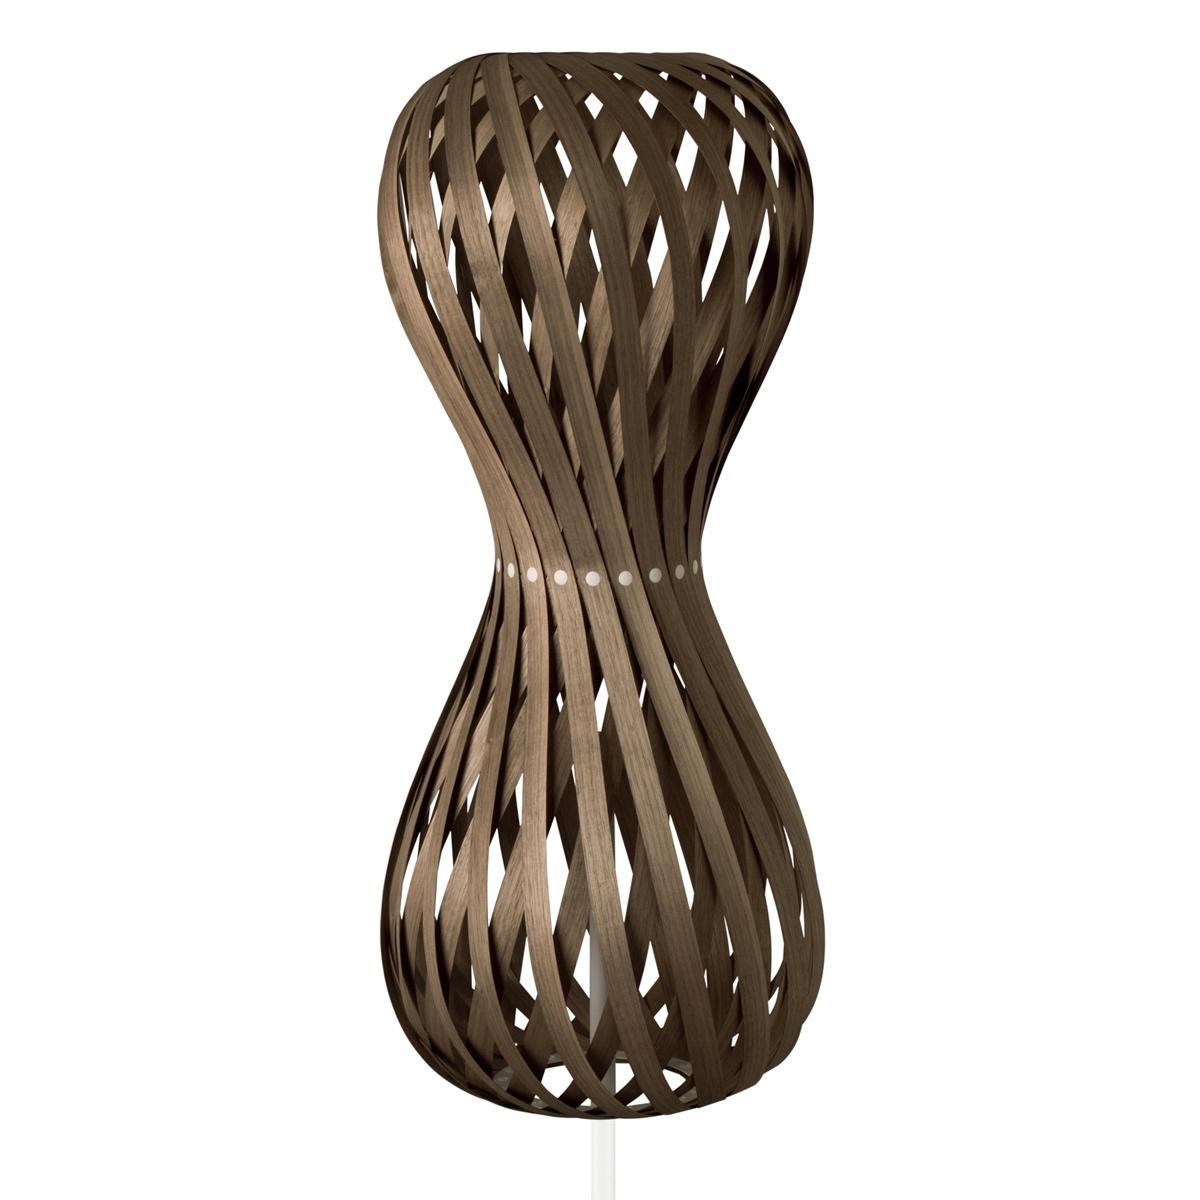 Lampadaire contemporain en bois en forme de sablier